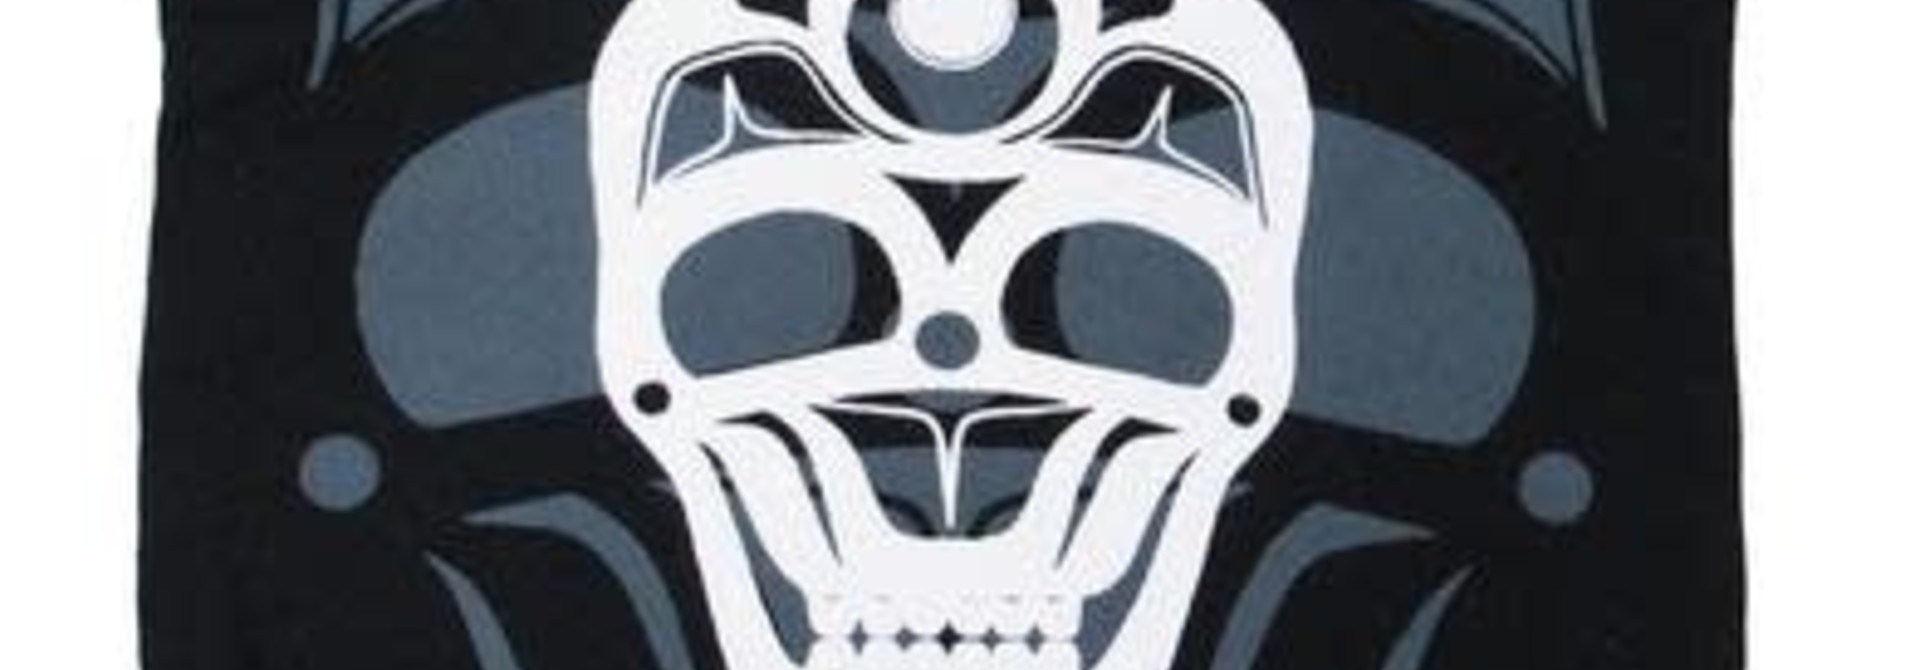 Eco Zipper Pouch - Skull by James Johnson